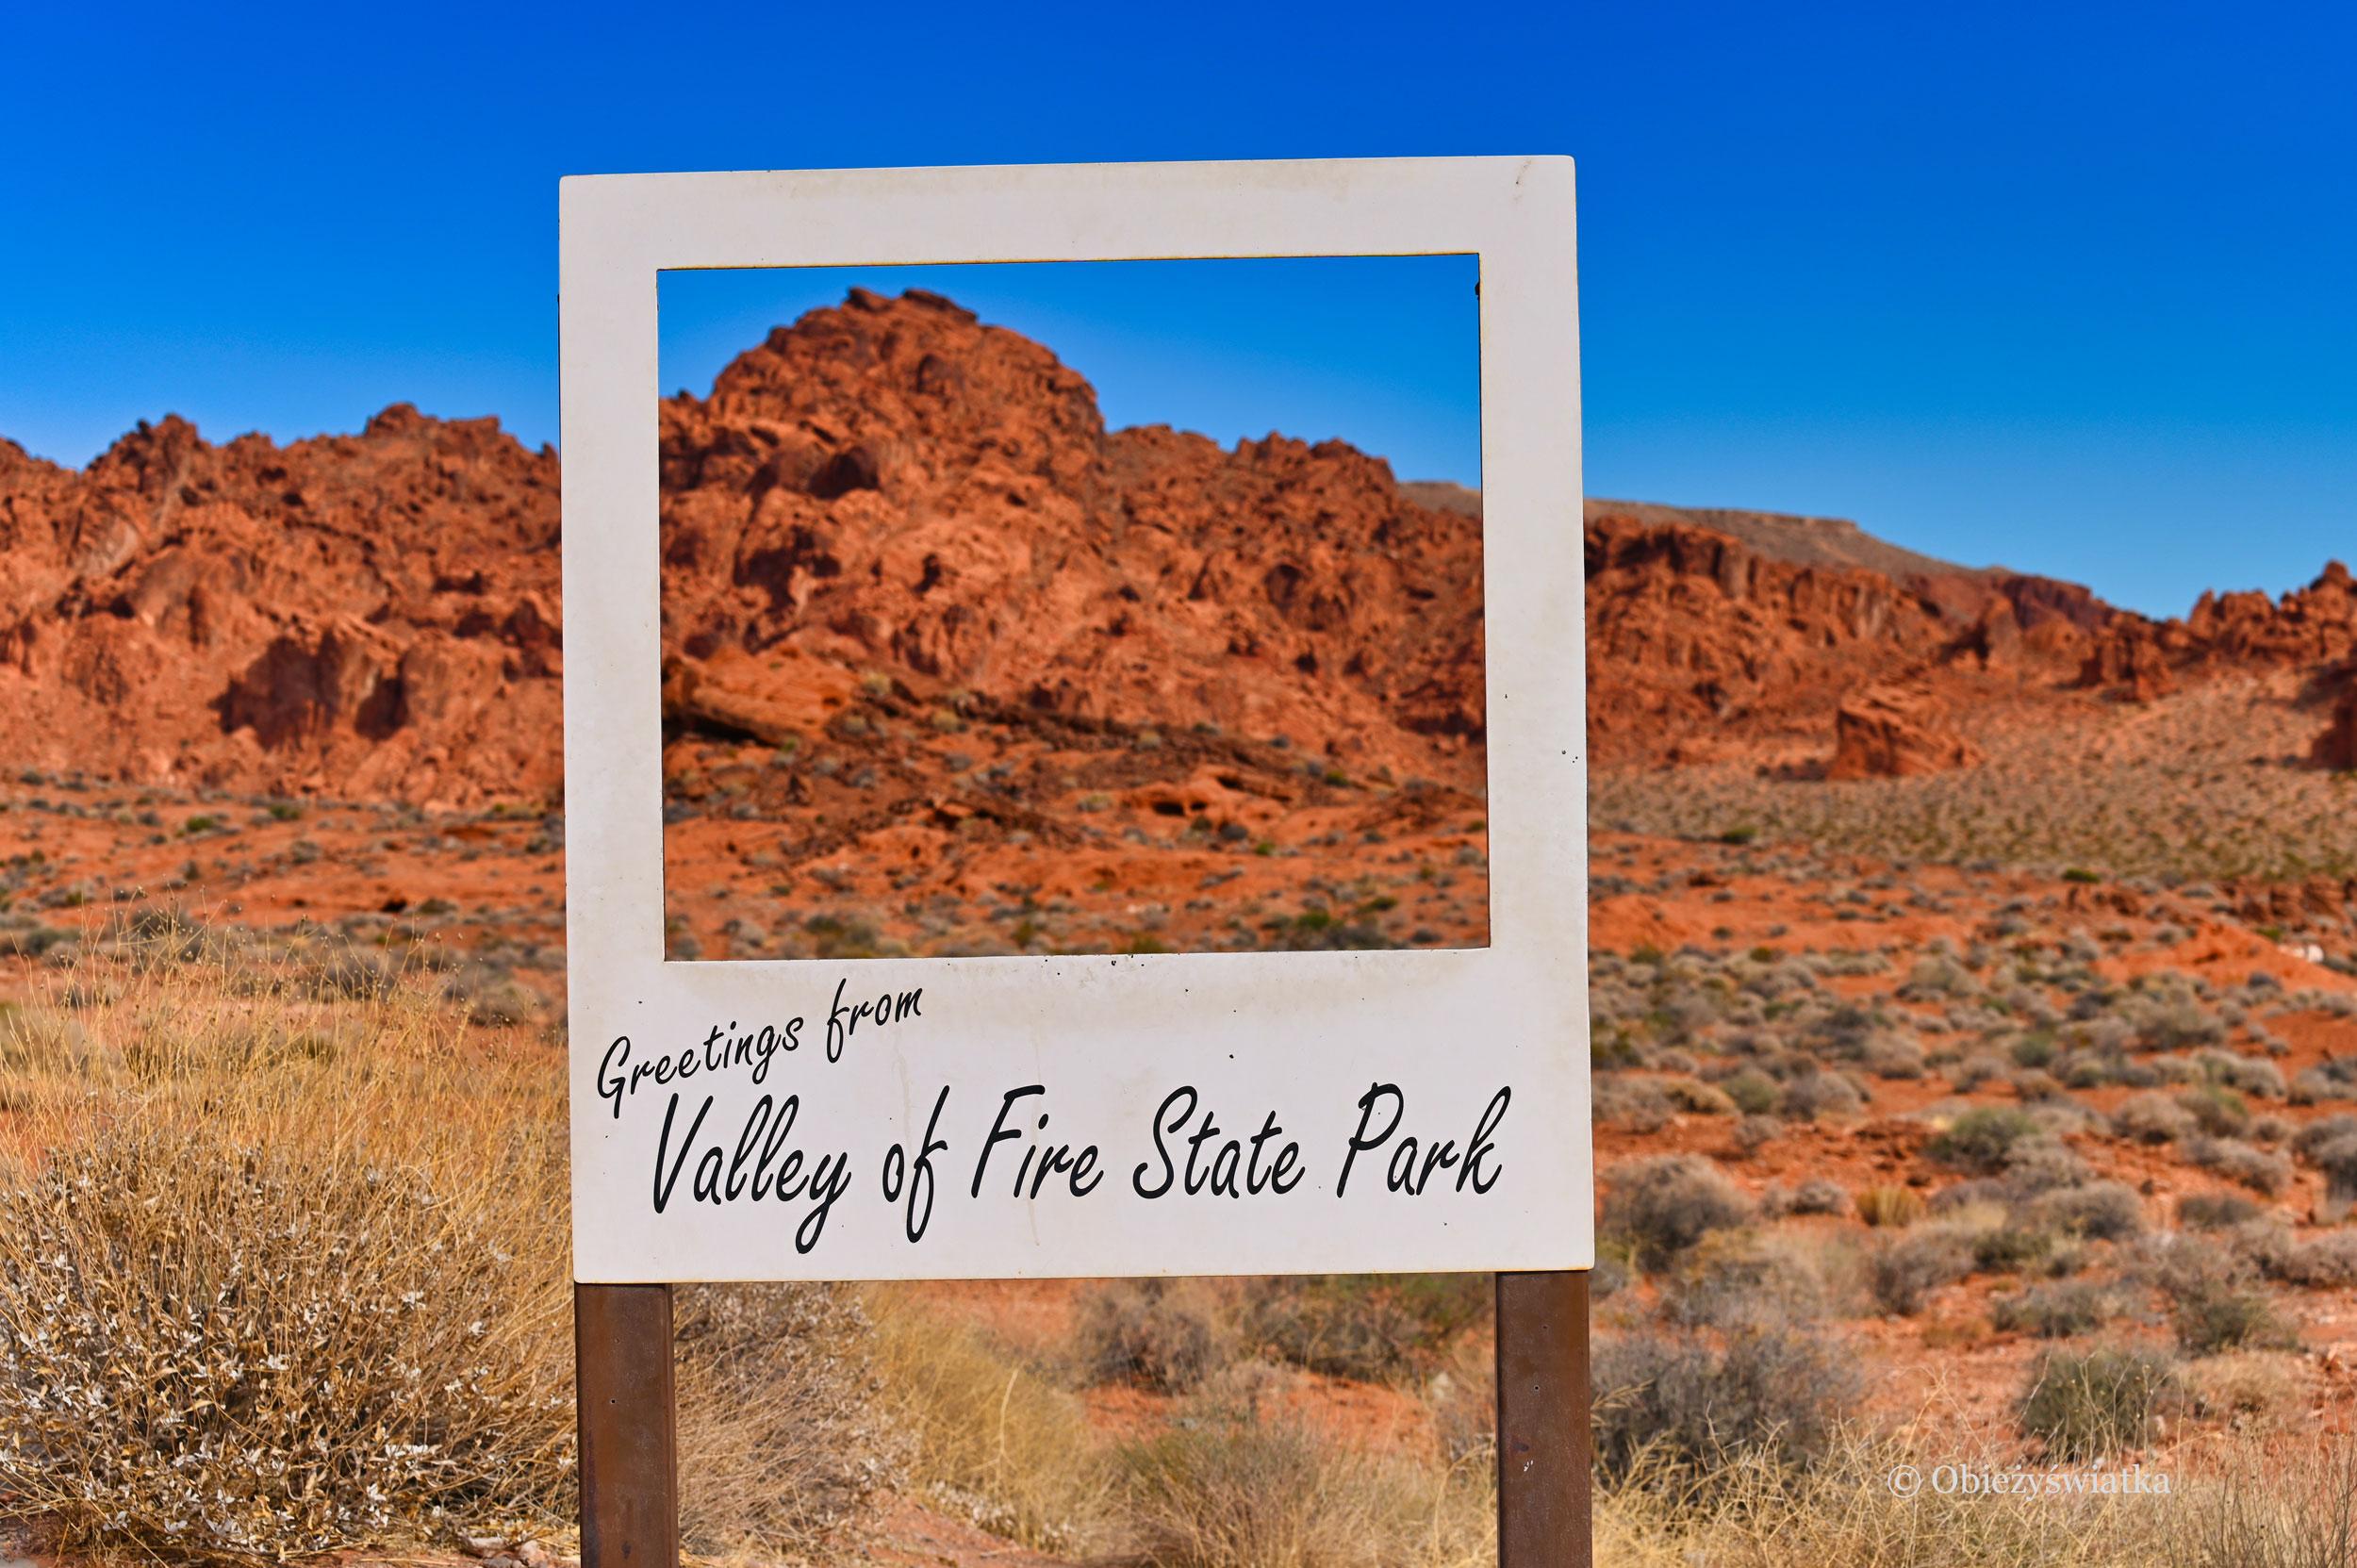 Pomysłowo - Valley of Fire